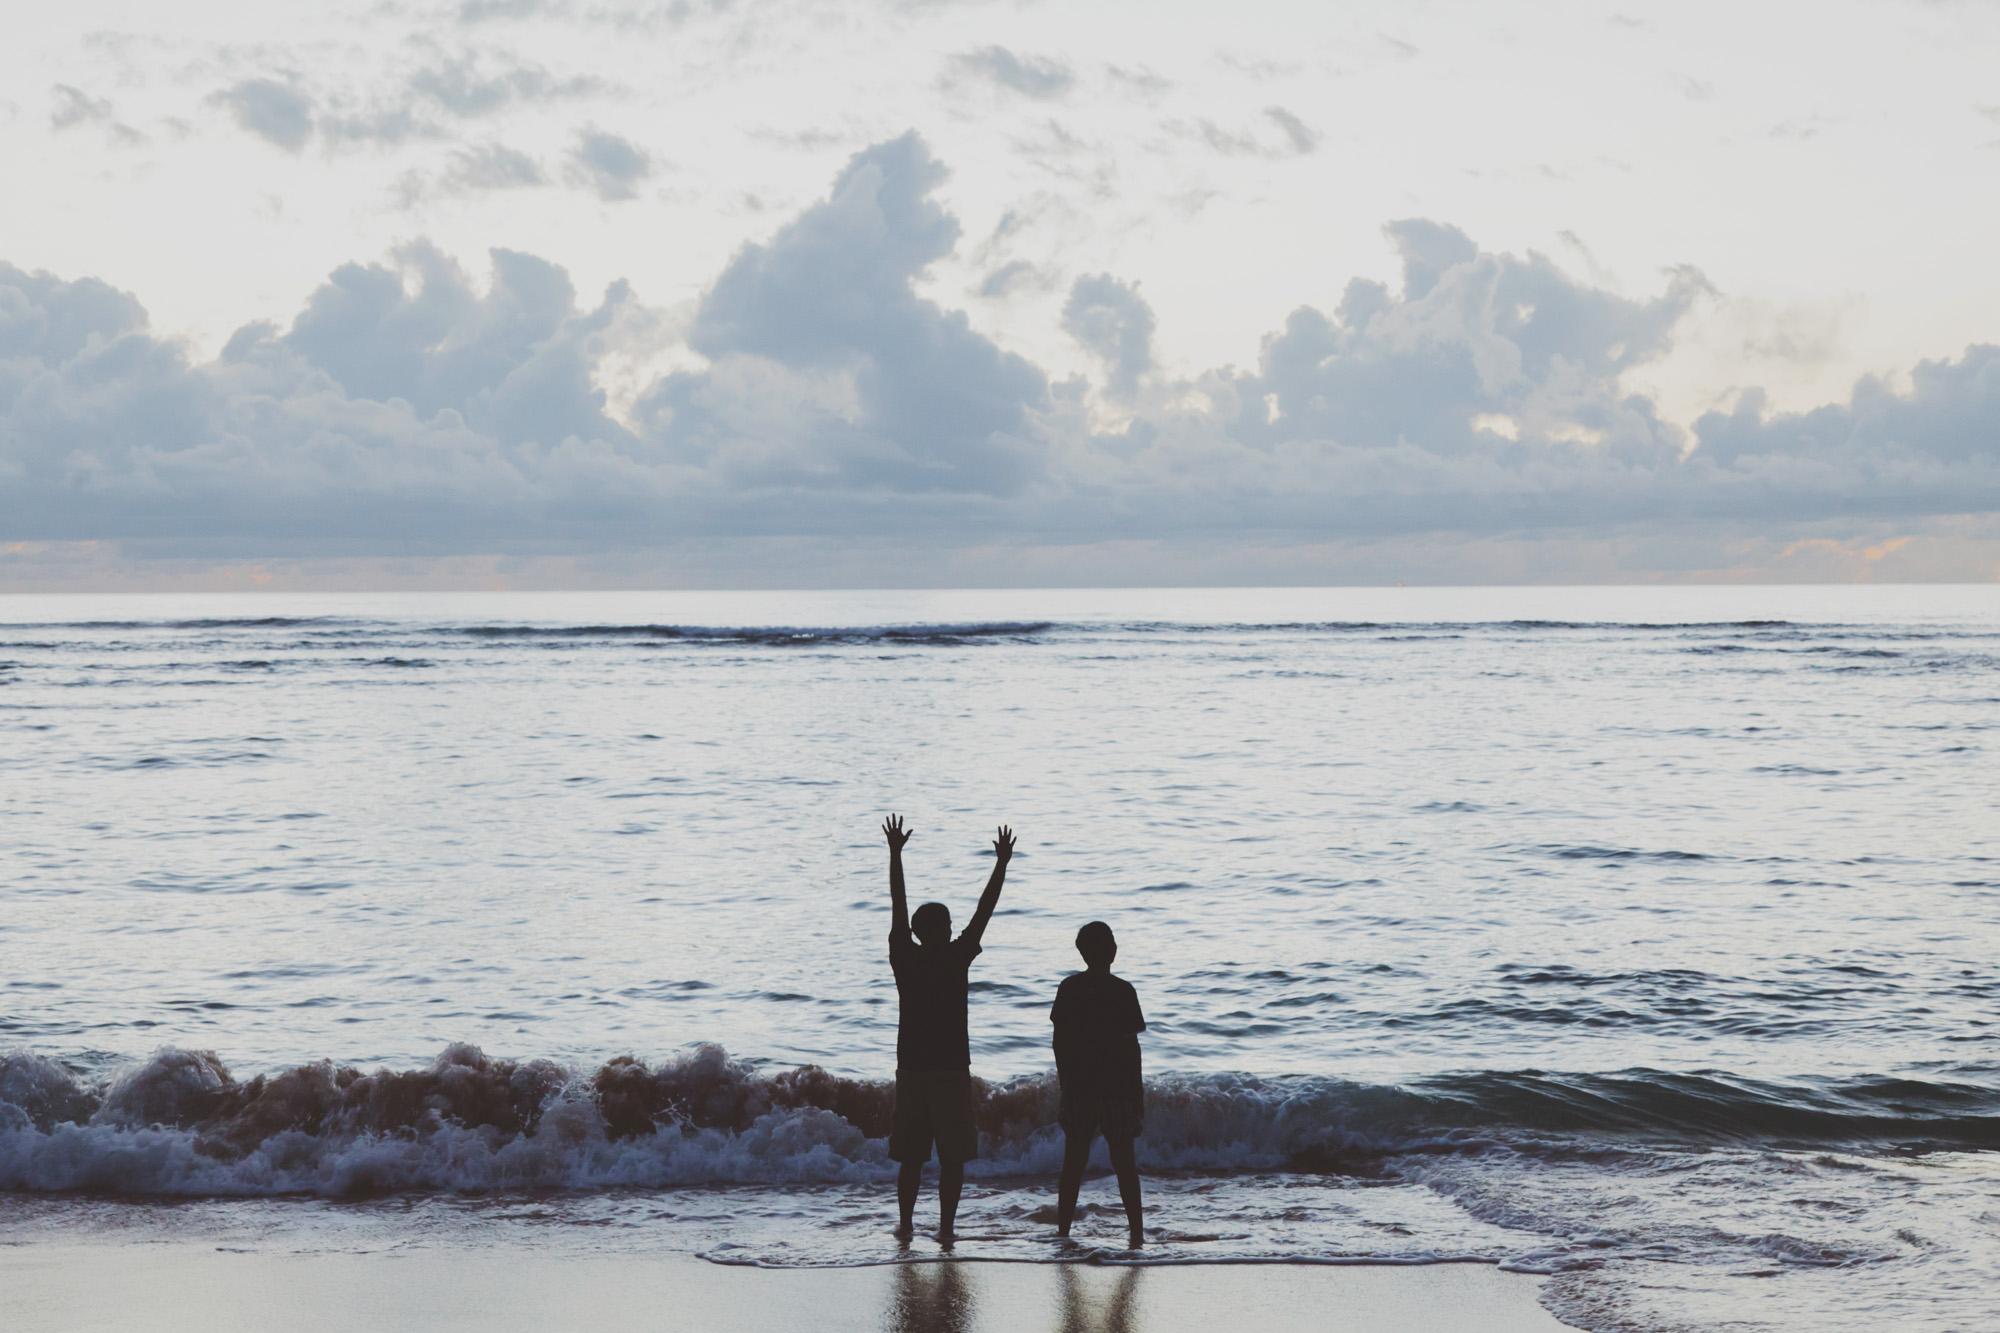 Hawaii stocksy 28_1.jpg